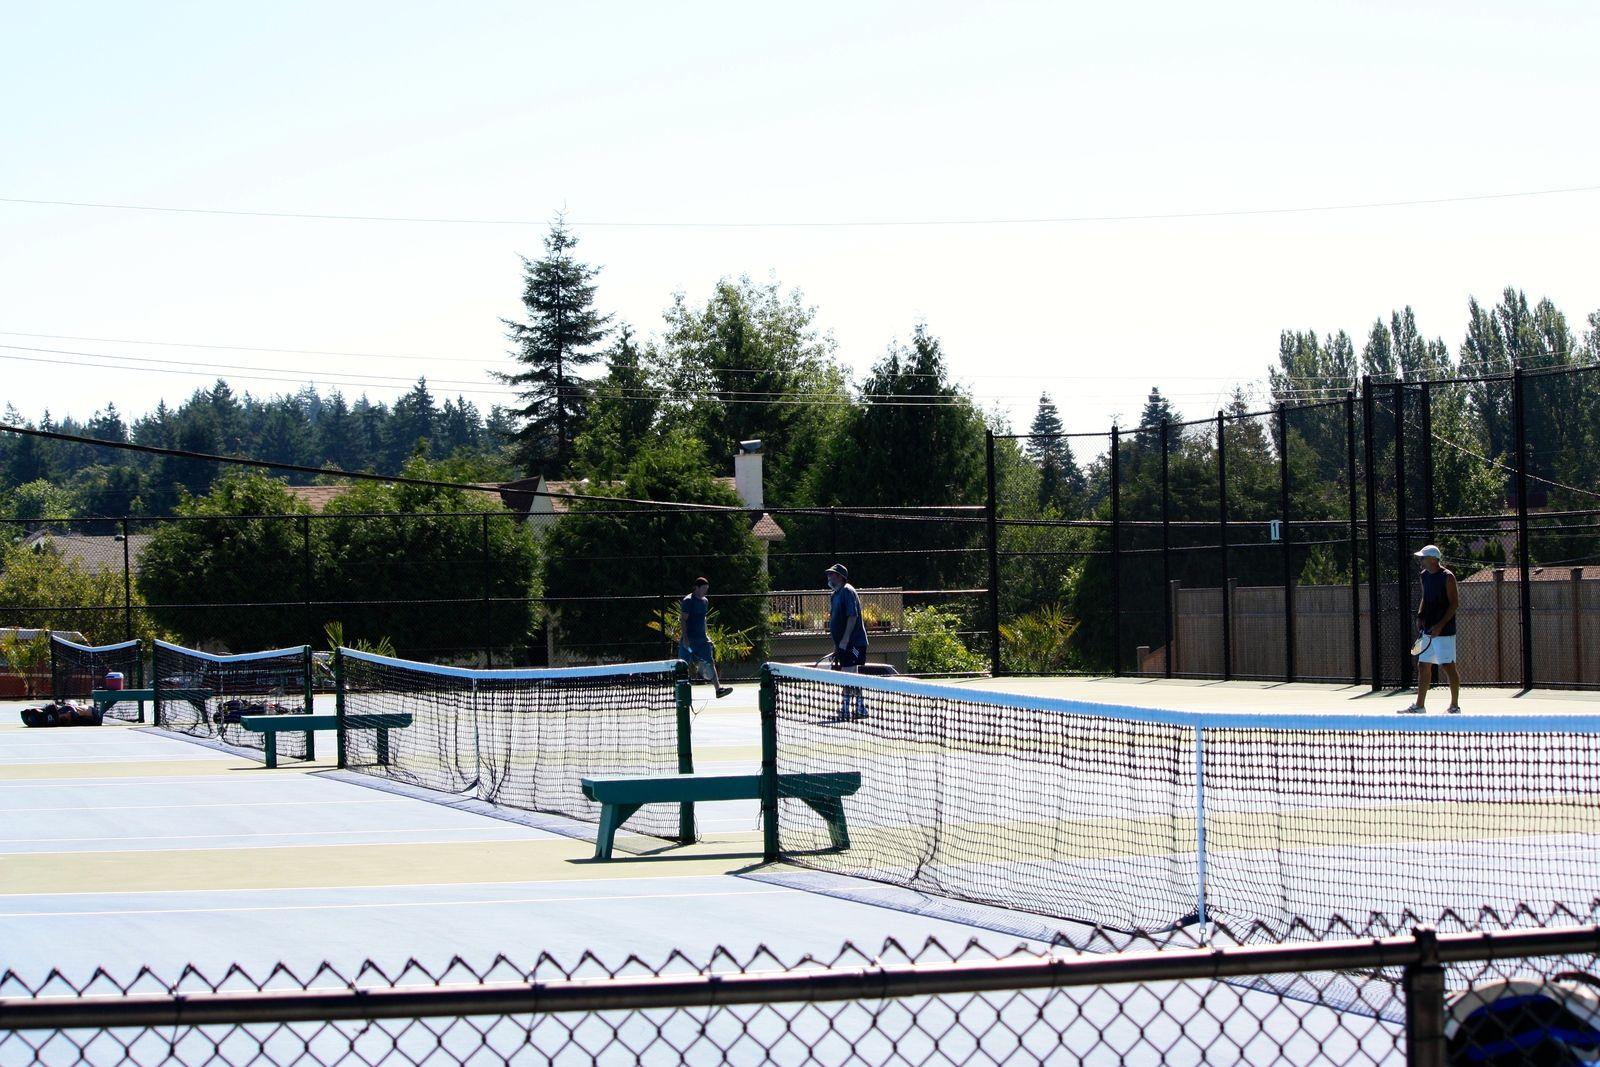 tennis-tourist-comox-british-columbia-anderton-park-tennis-courts-half-court-view-kathy-london